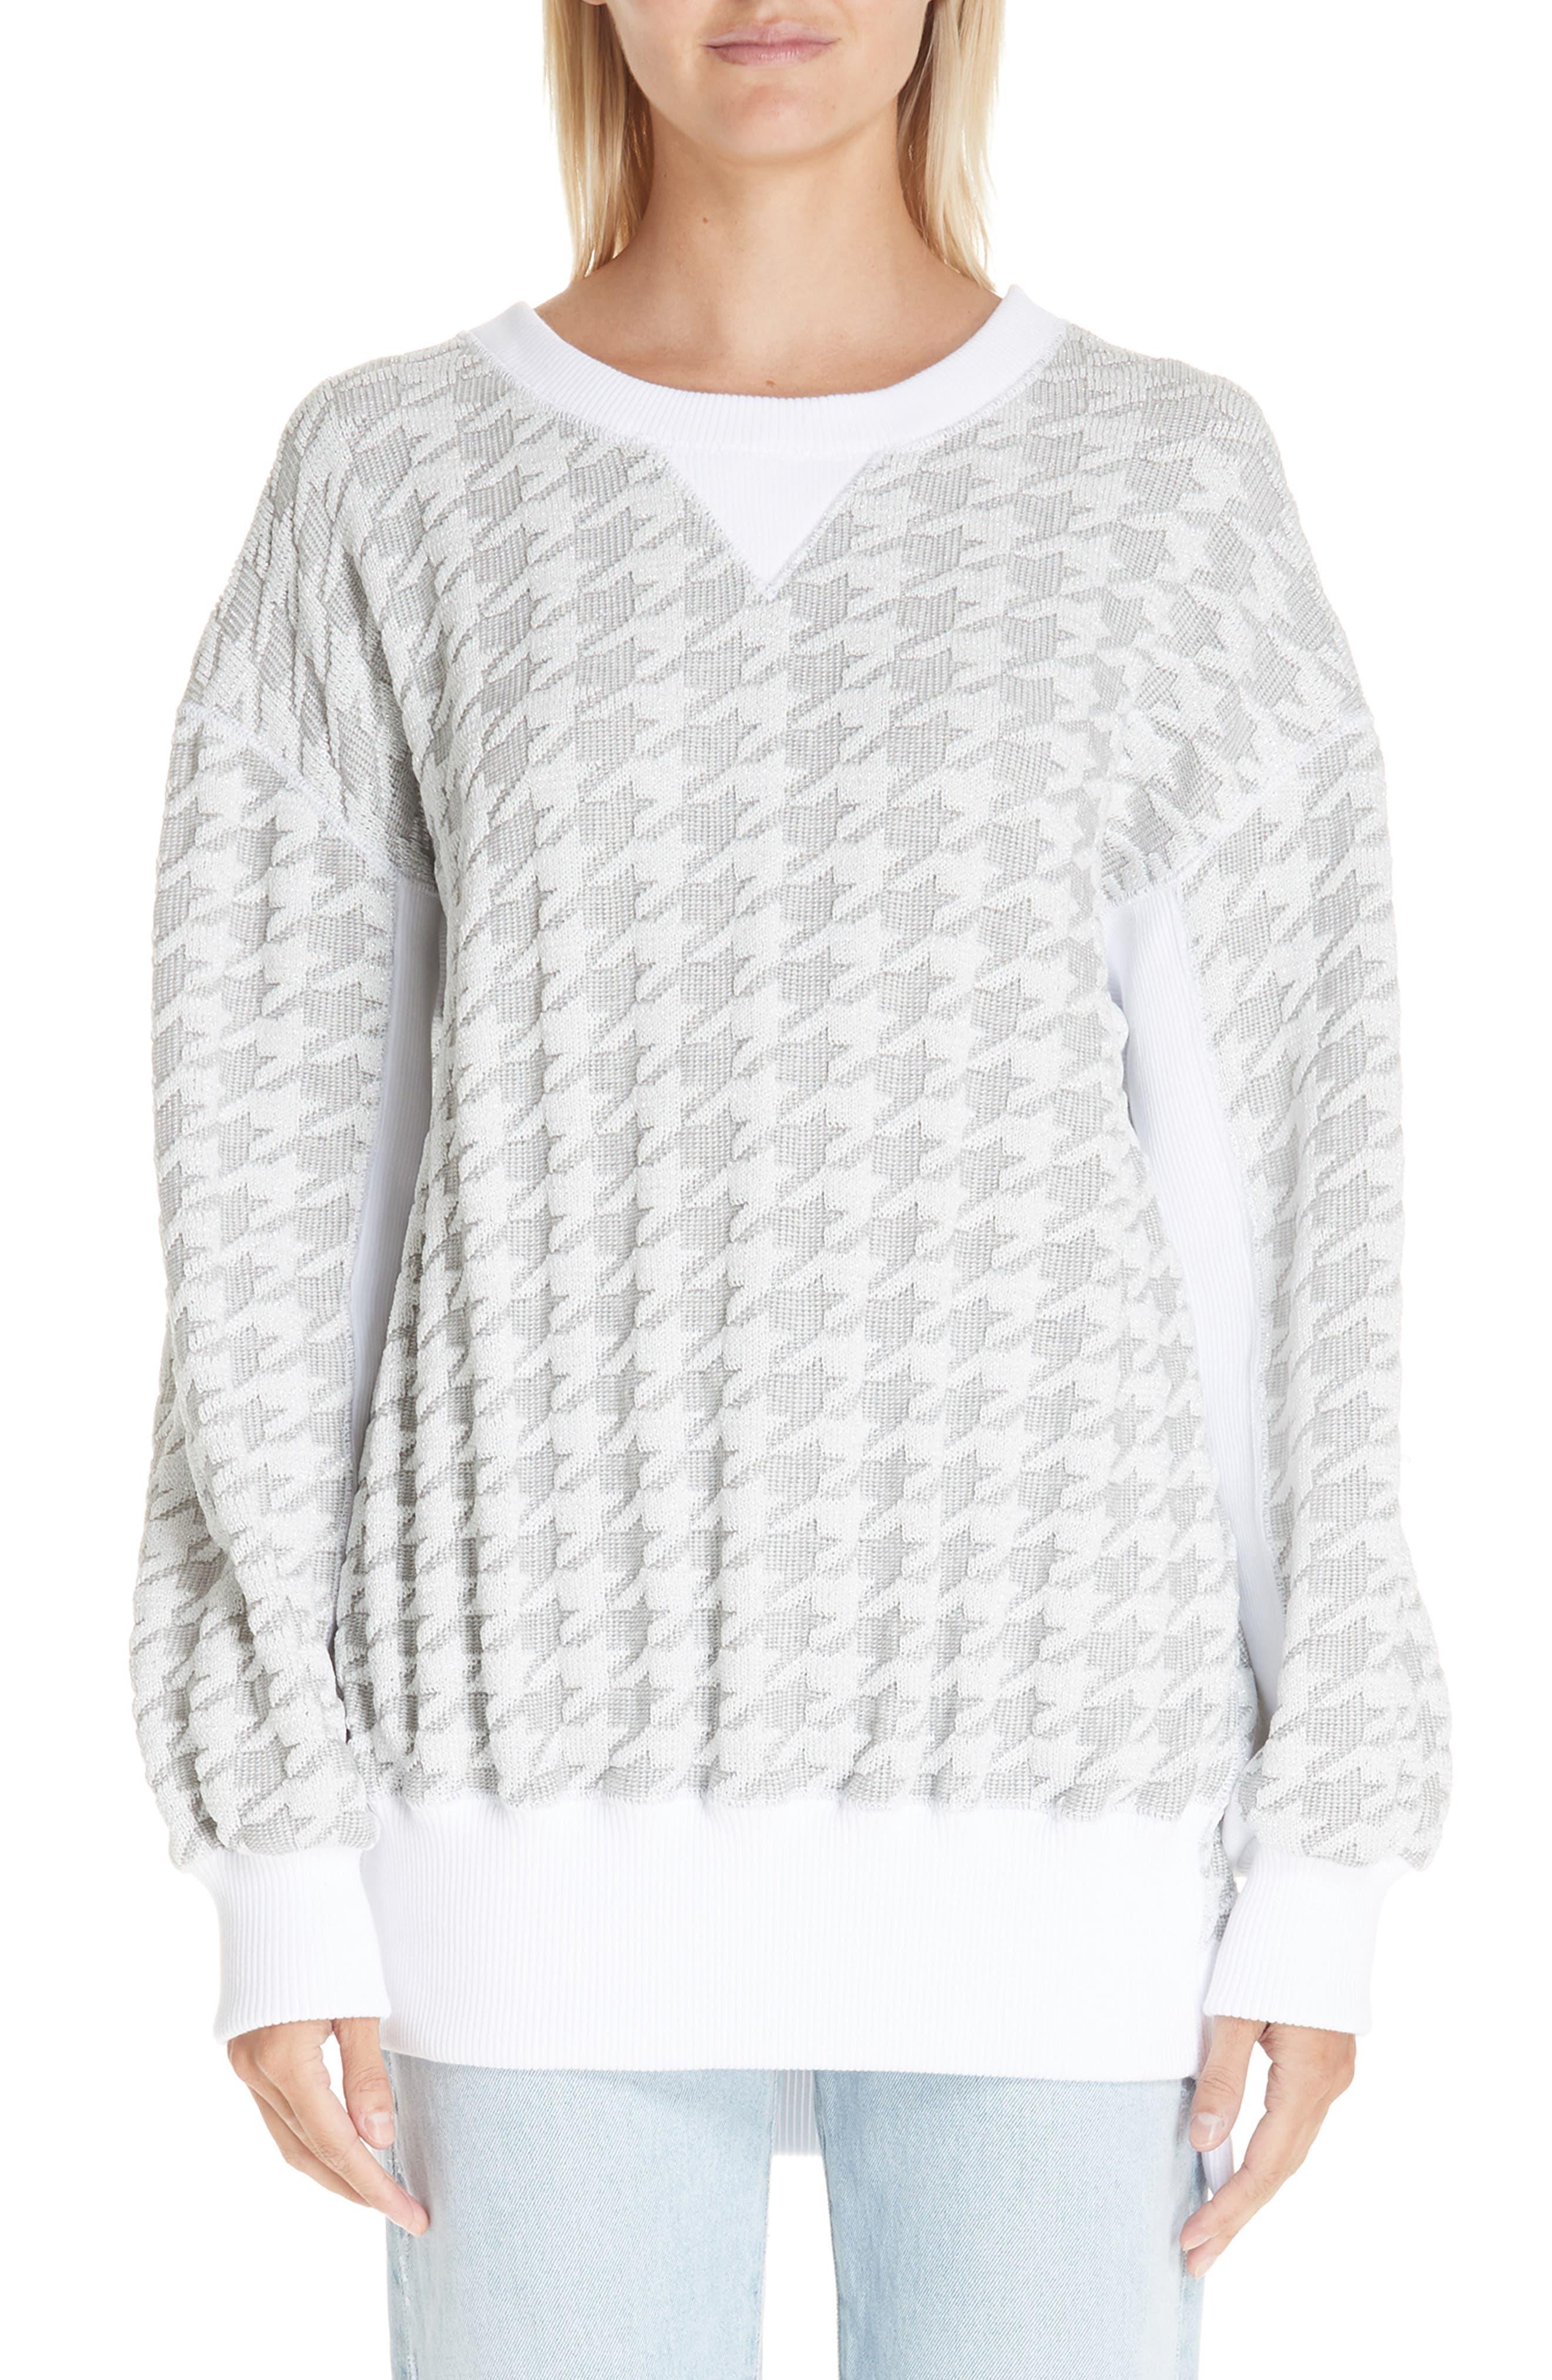 Houndstooth Sweatshirt,                         Main,                         color, 100